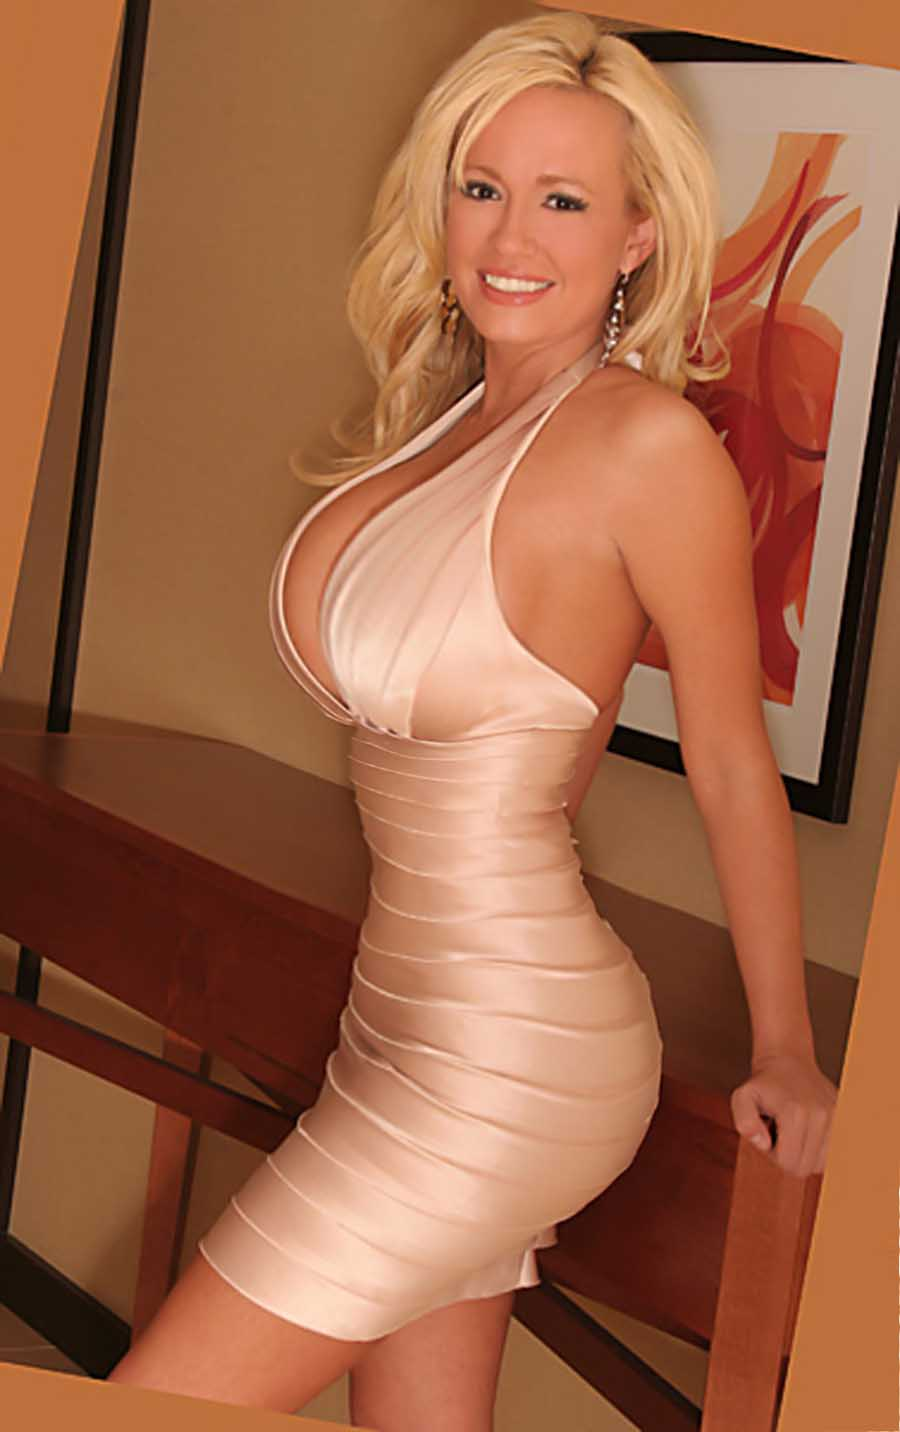 18 yr old linsey donovan webcam model 8